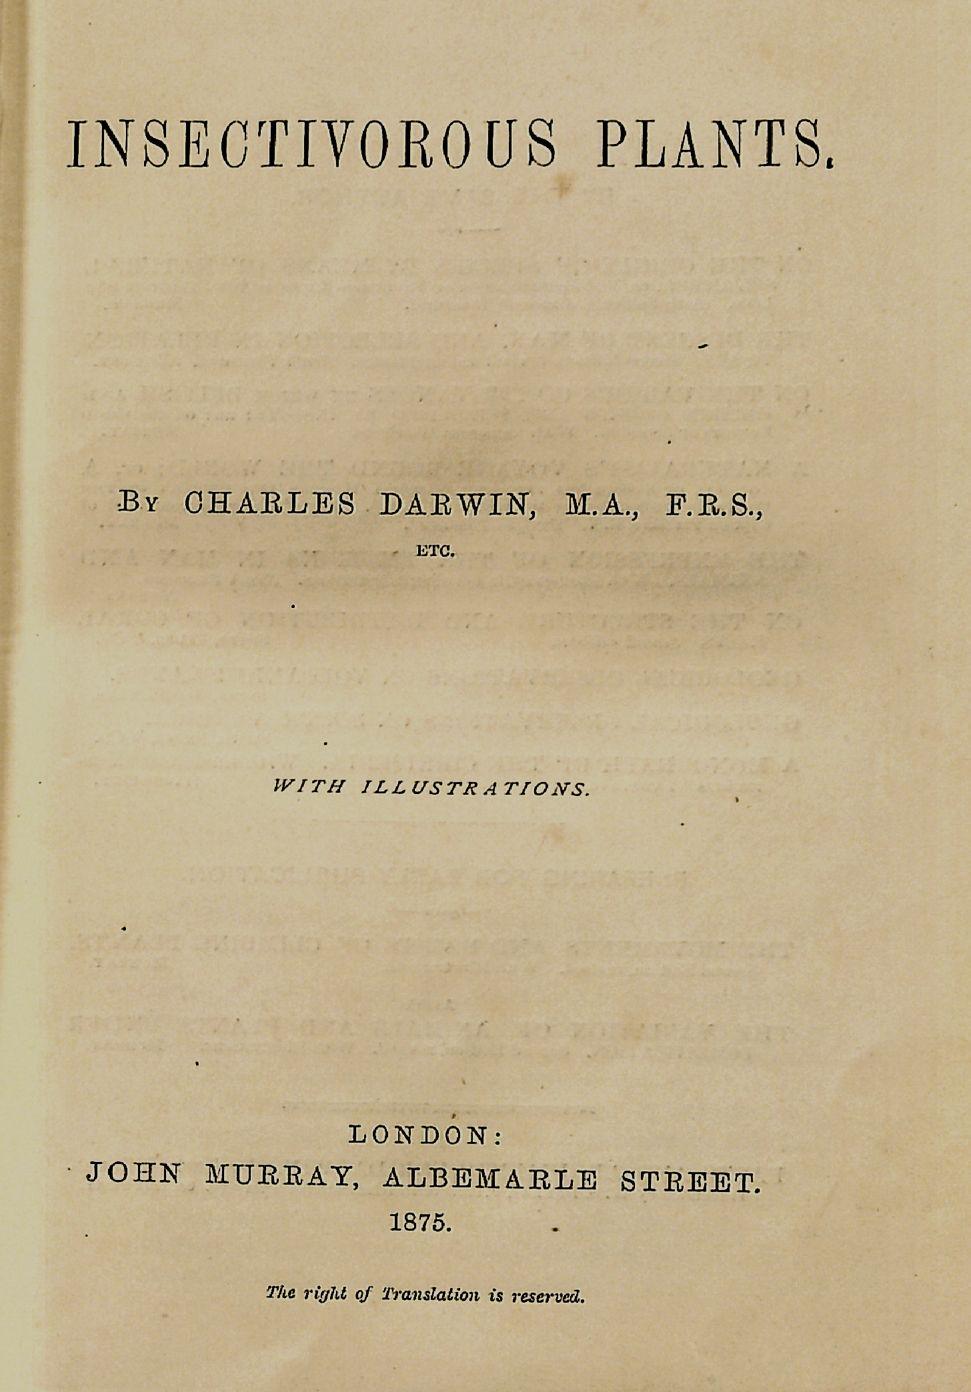 Charles darwin charles darwin darwin work quotes